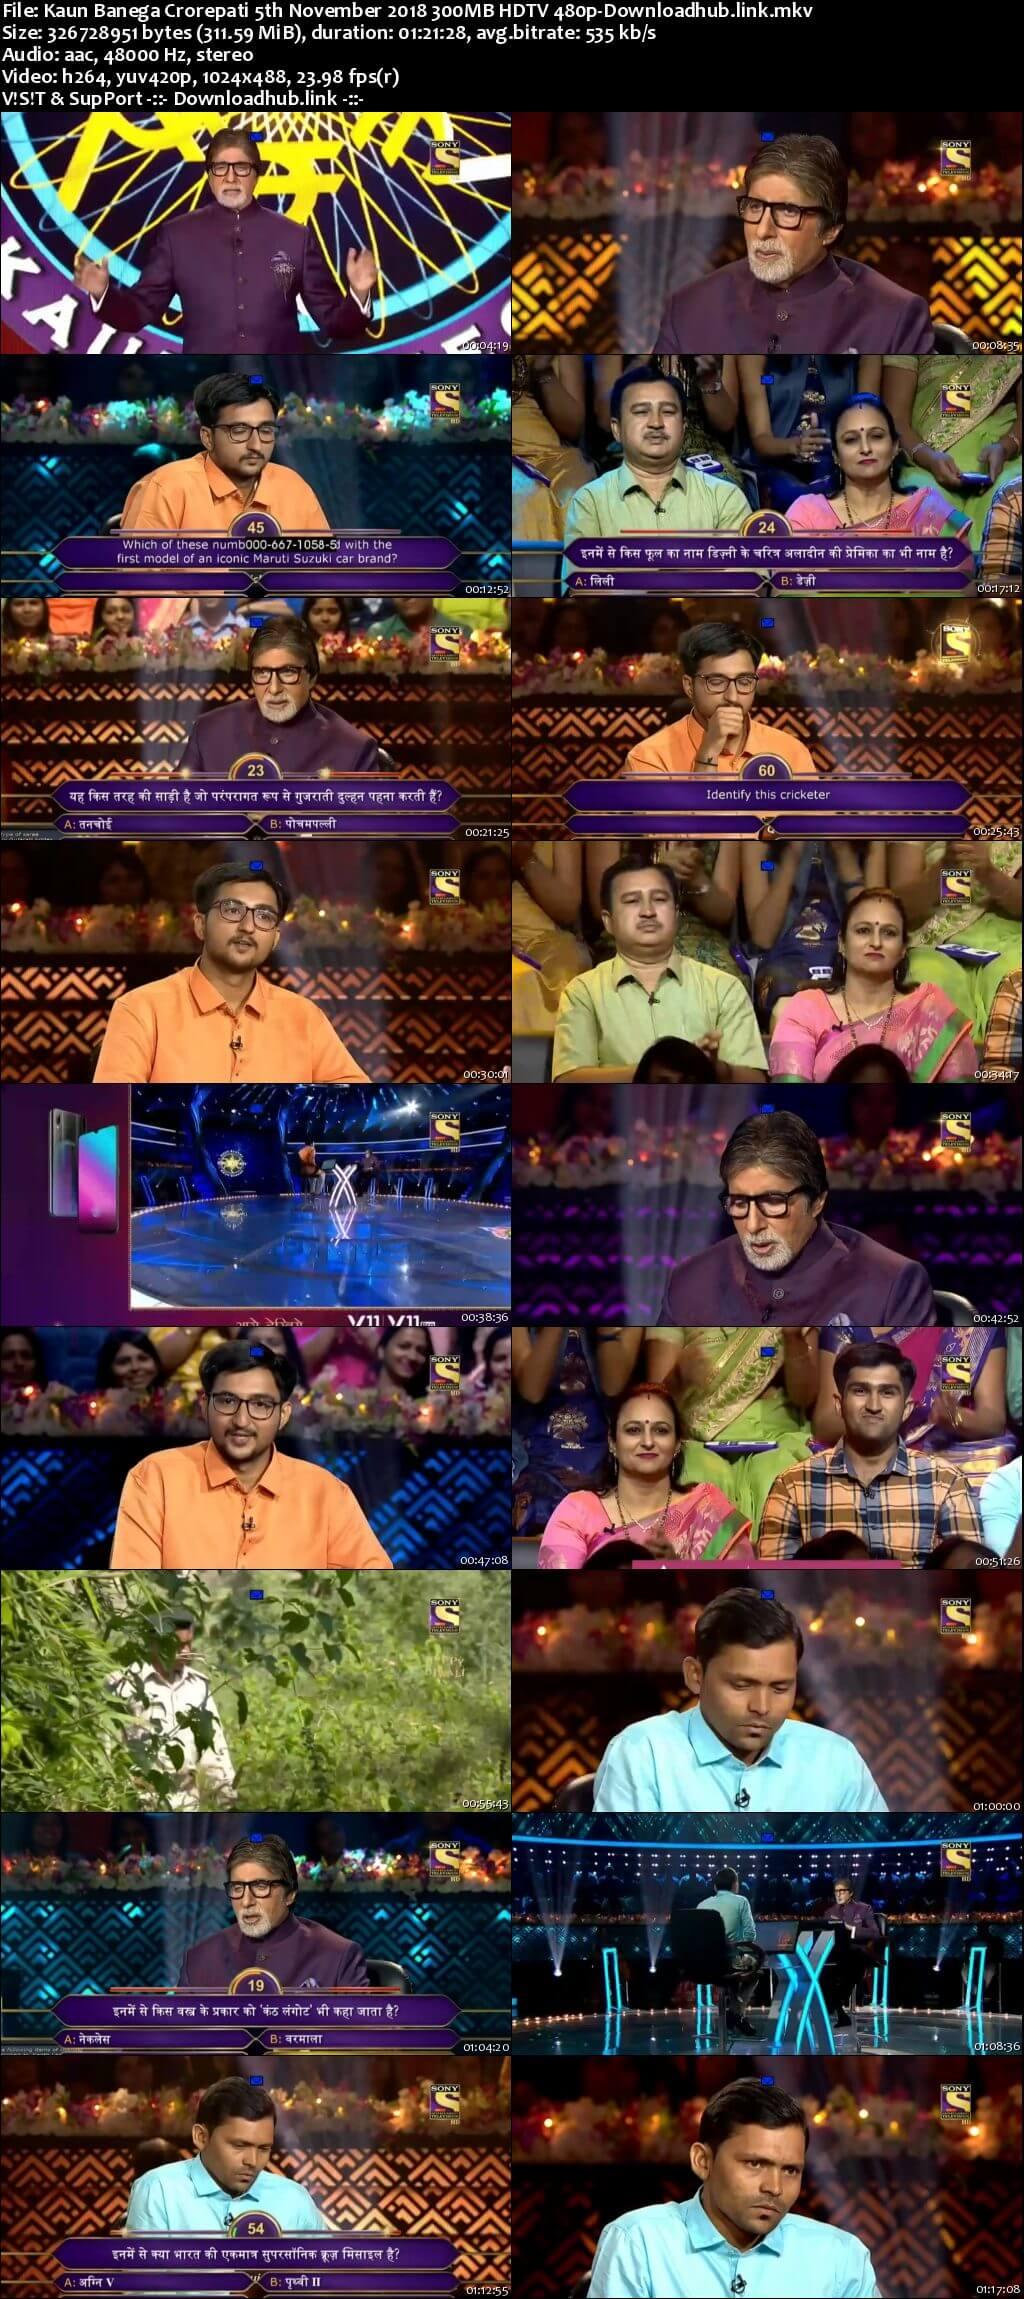 Kaun Banega Crorepati 5th November 2018 300MB HDTV 480p